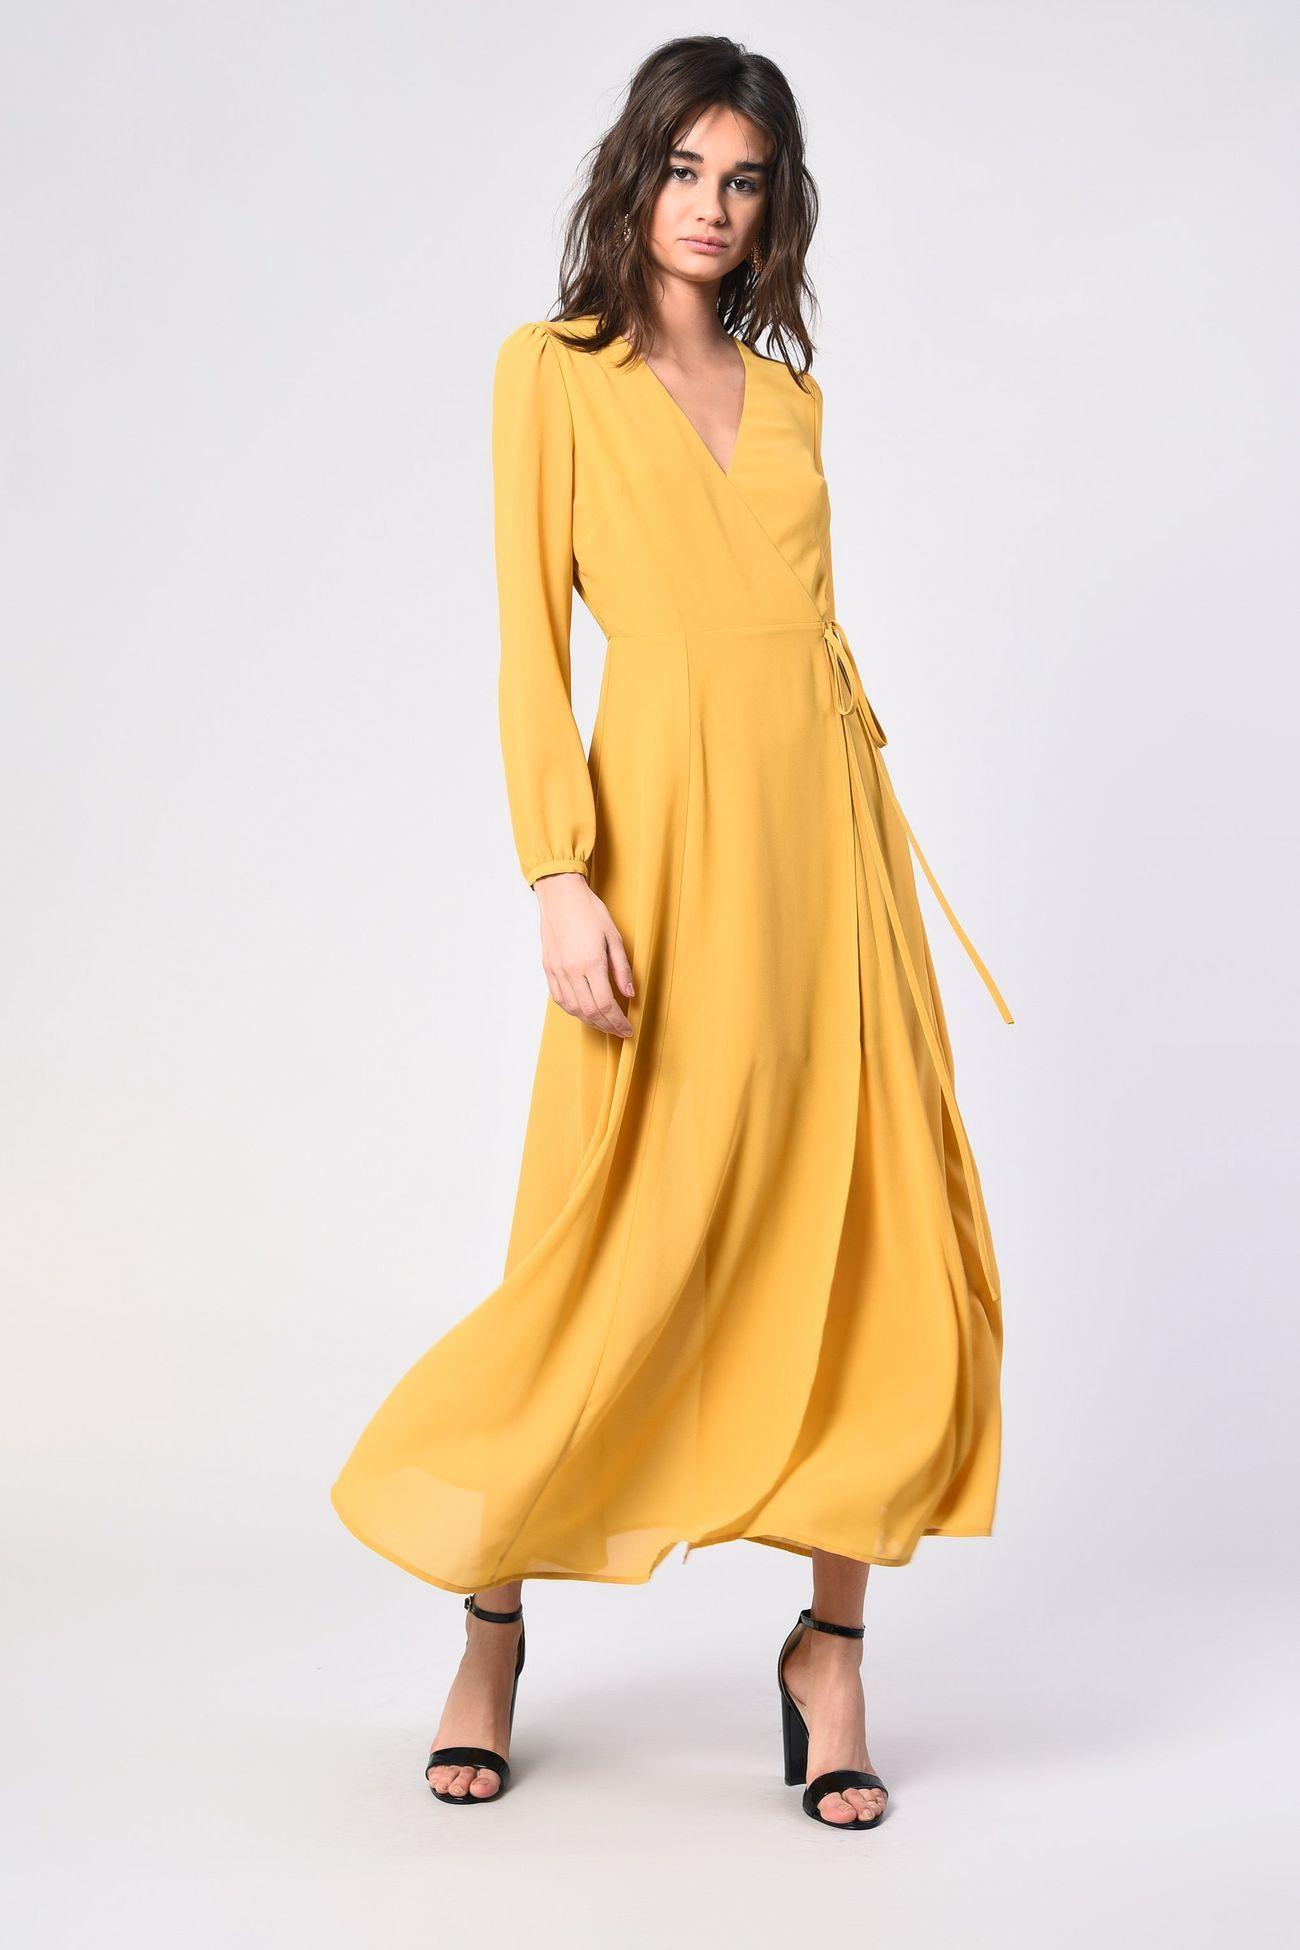 Summer evening dresses